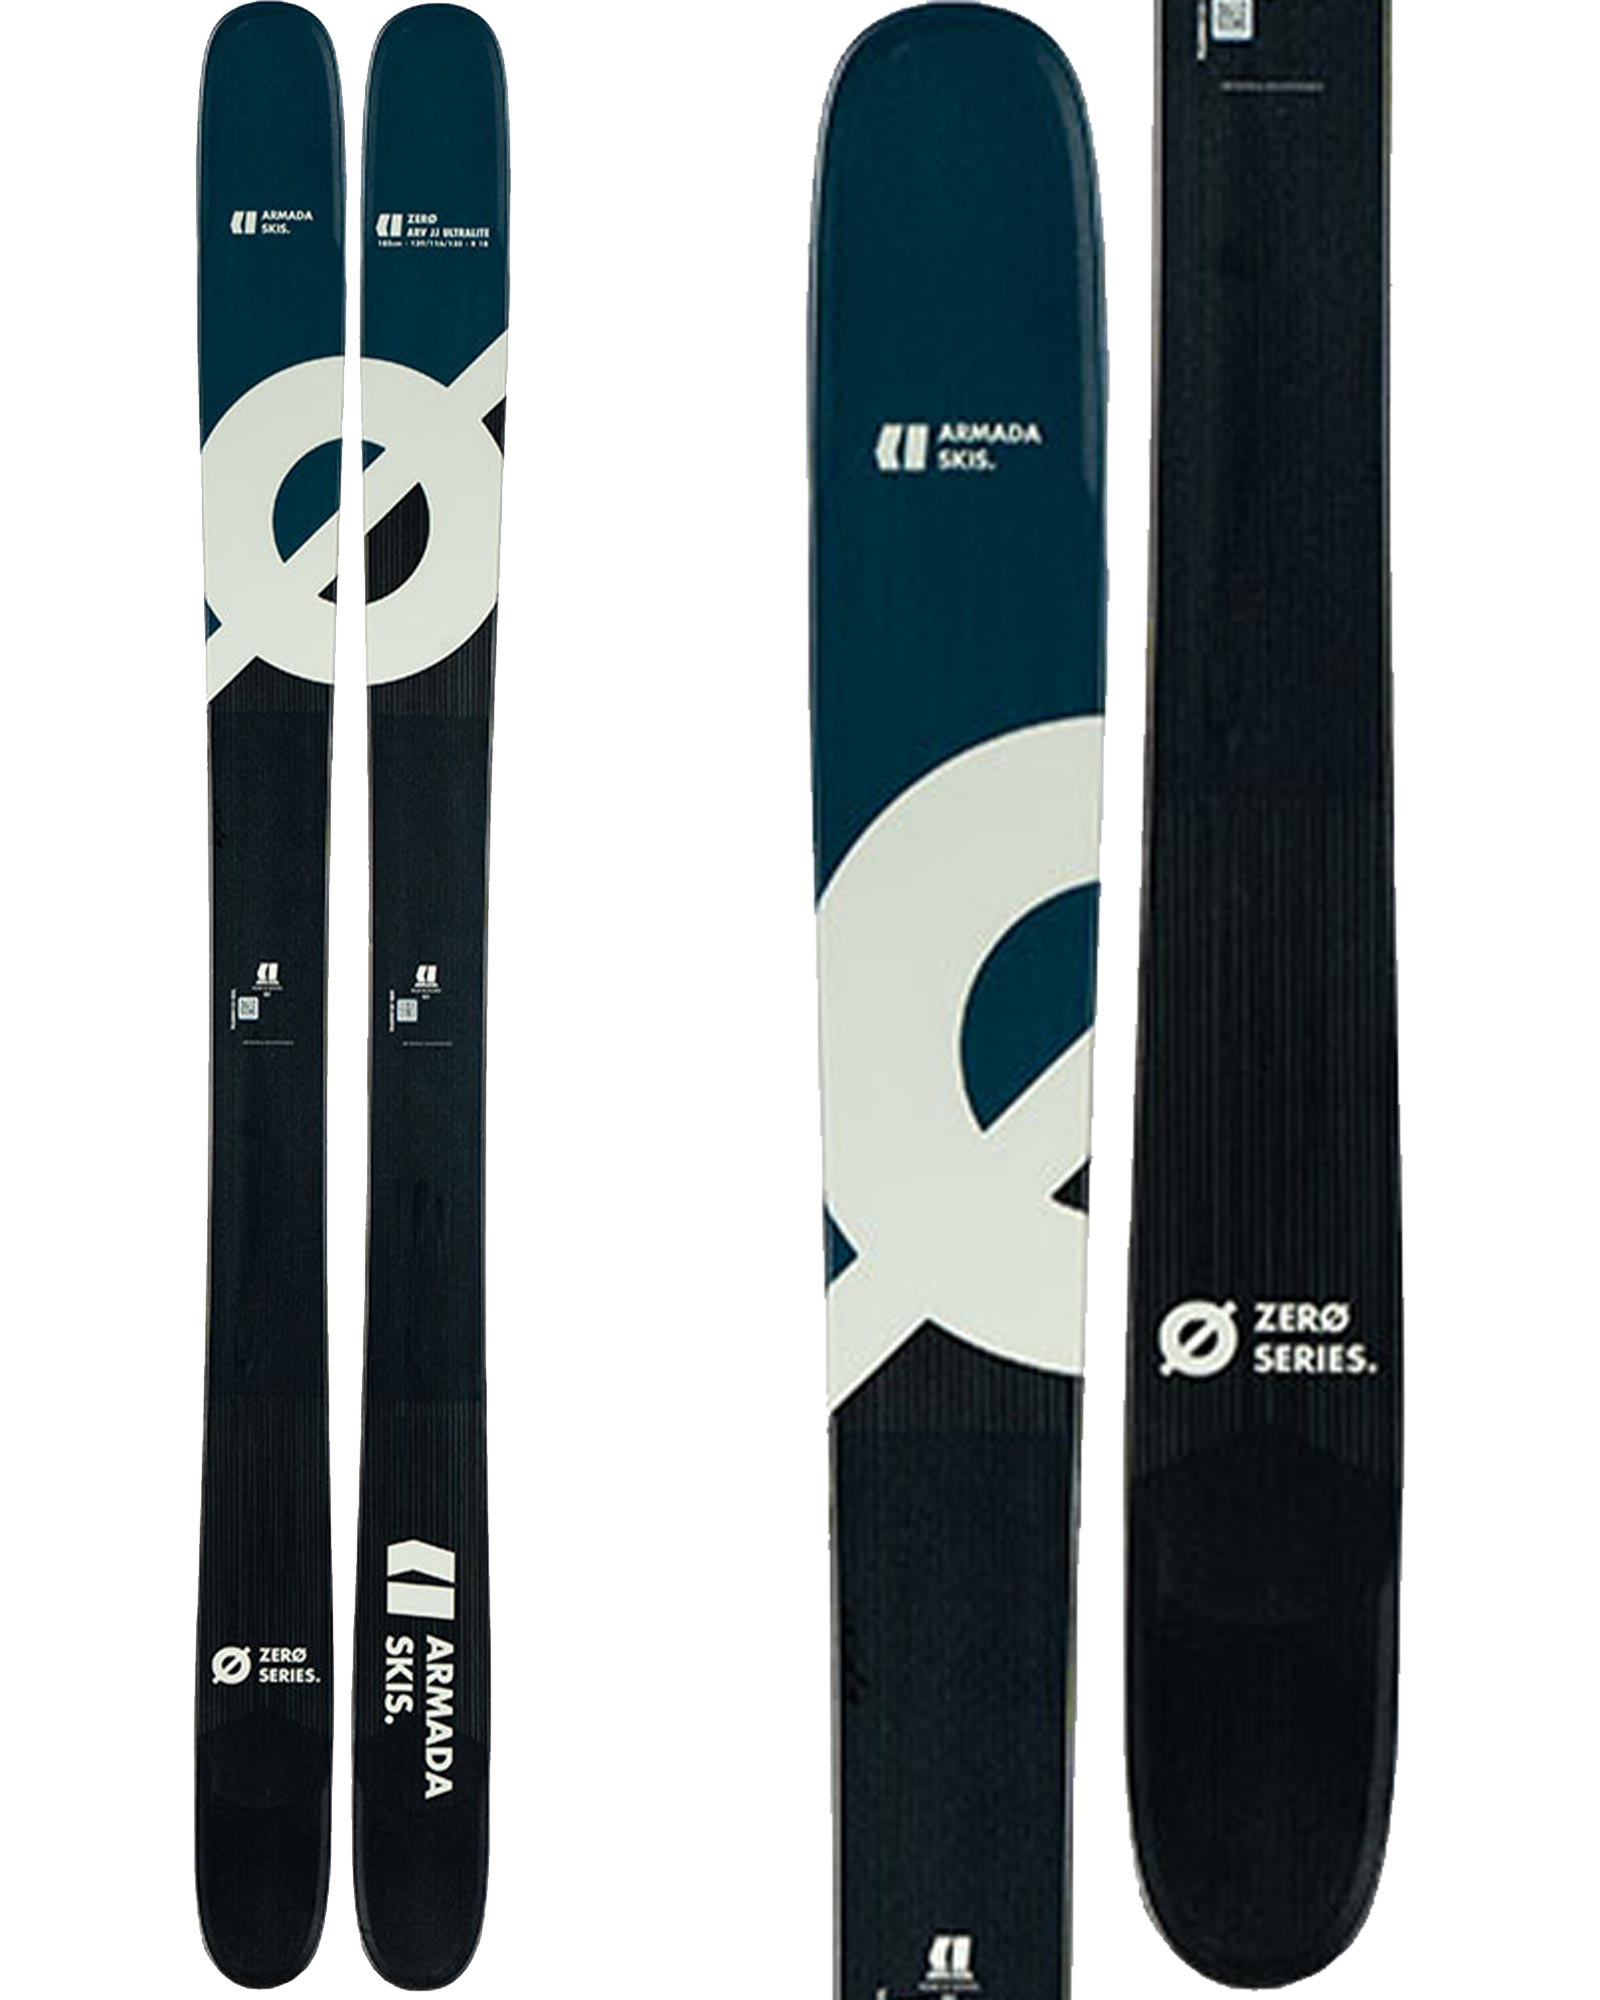 Armada Men's ARV 116 JJ Ultralite Freestyle Skis 2020 / 2021 0